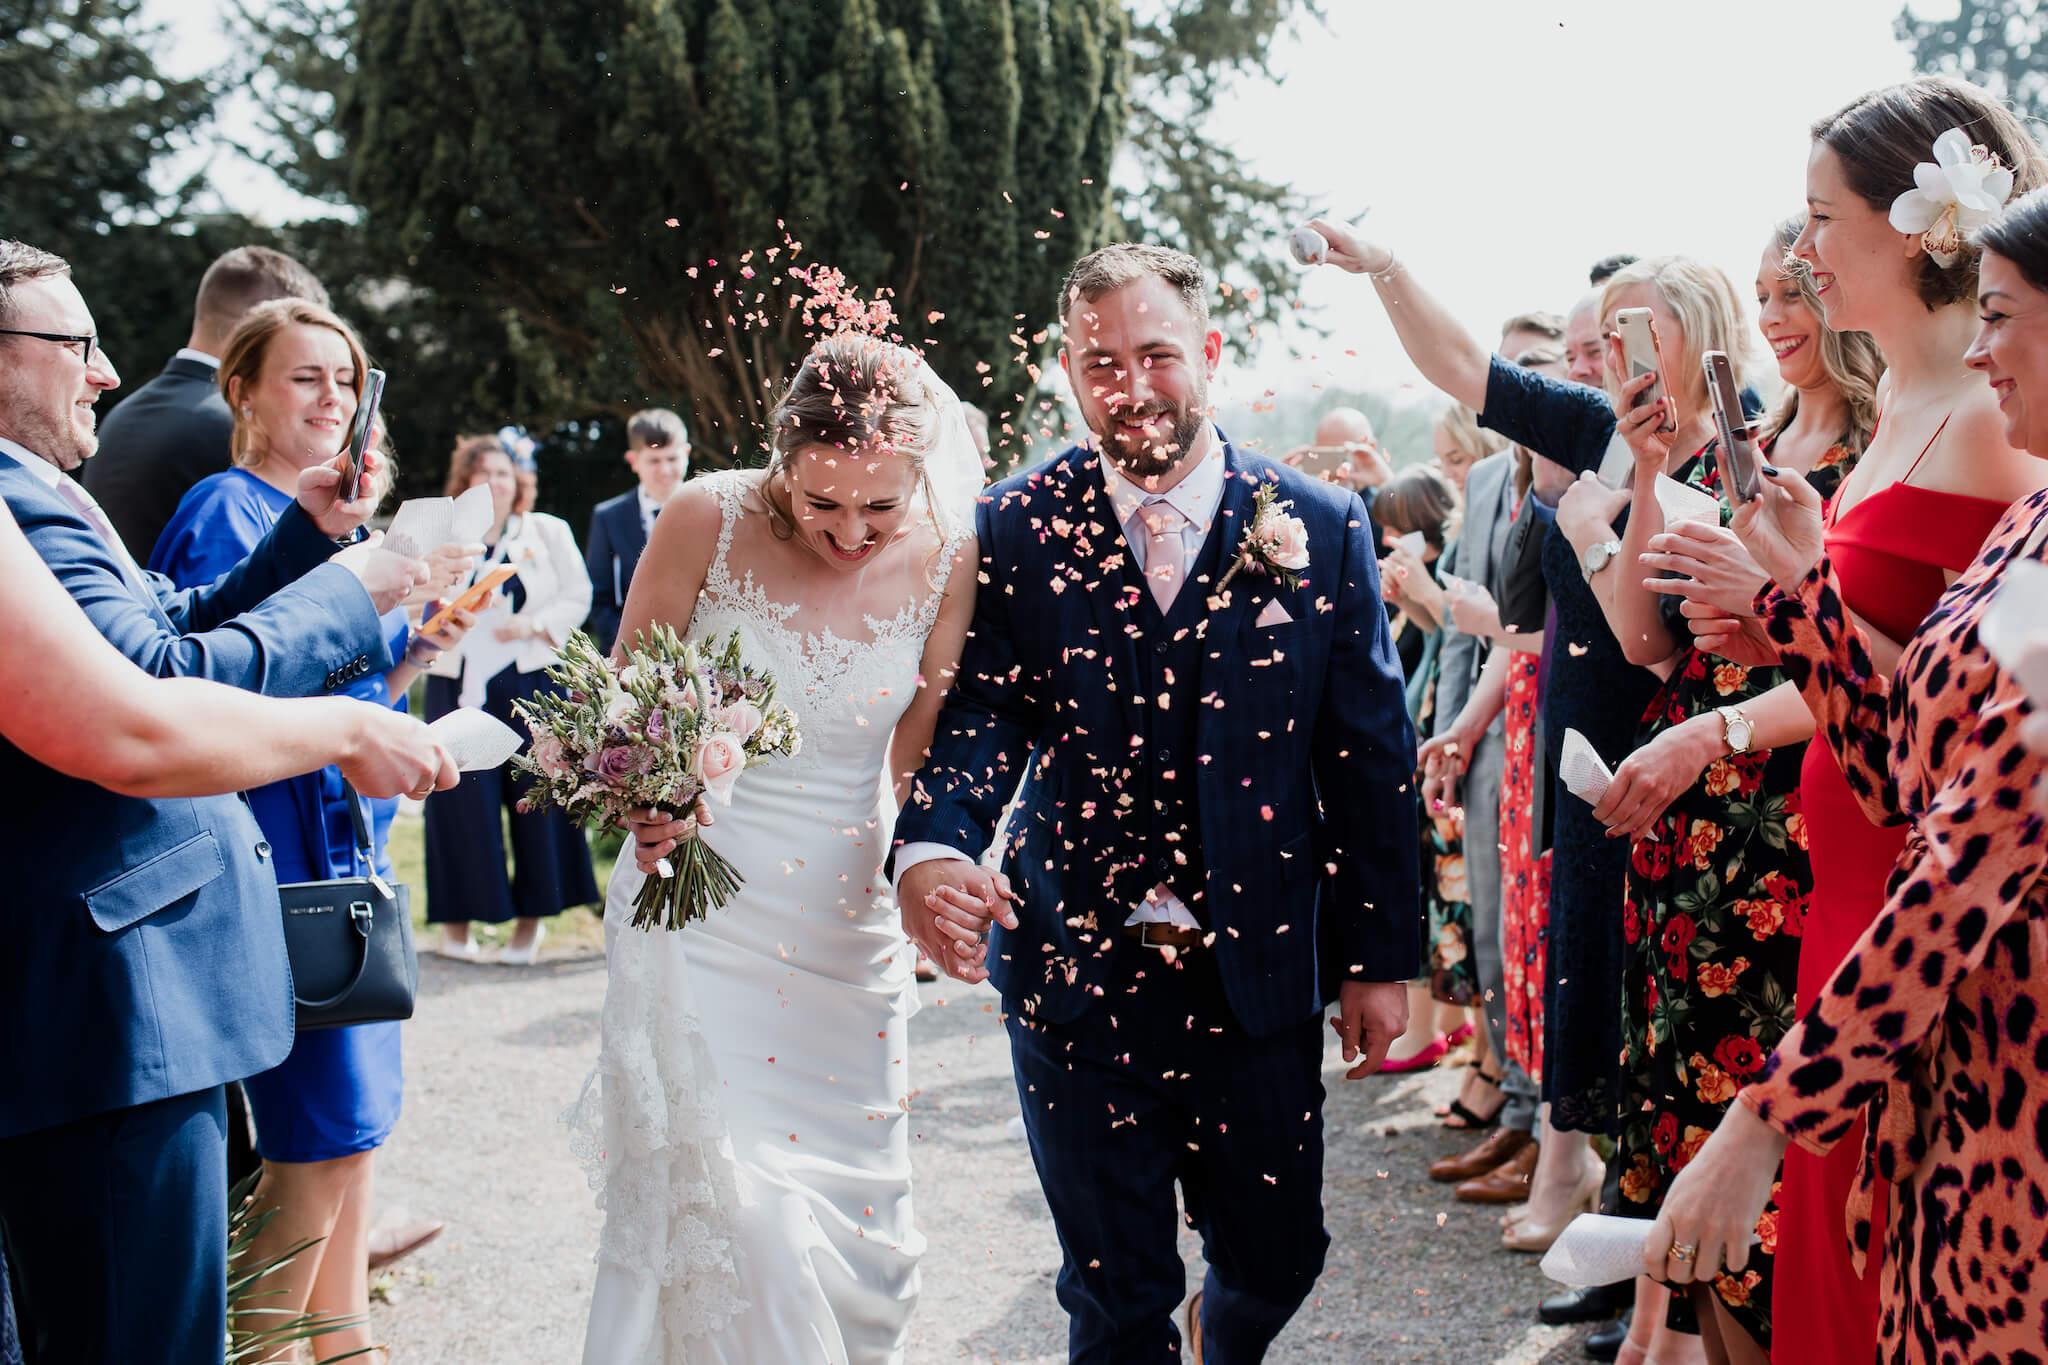 Modern, documentary wedding photographer in Bristol, South West & UK. Bristol Contemporary Photography provides wedding photography in Bristol, wedding photography in Bath and wedding photography in Gloucester.